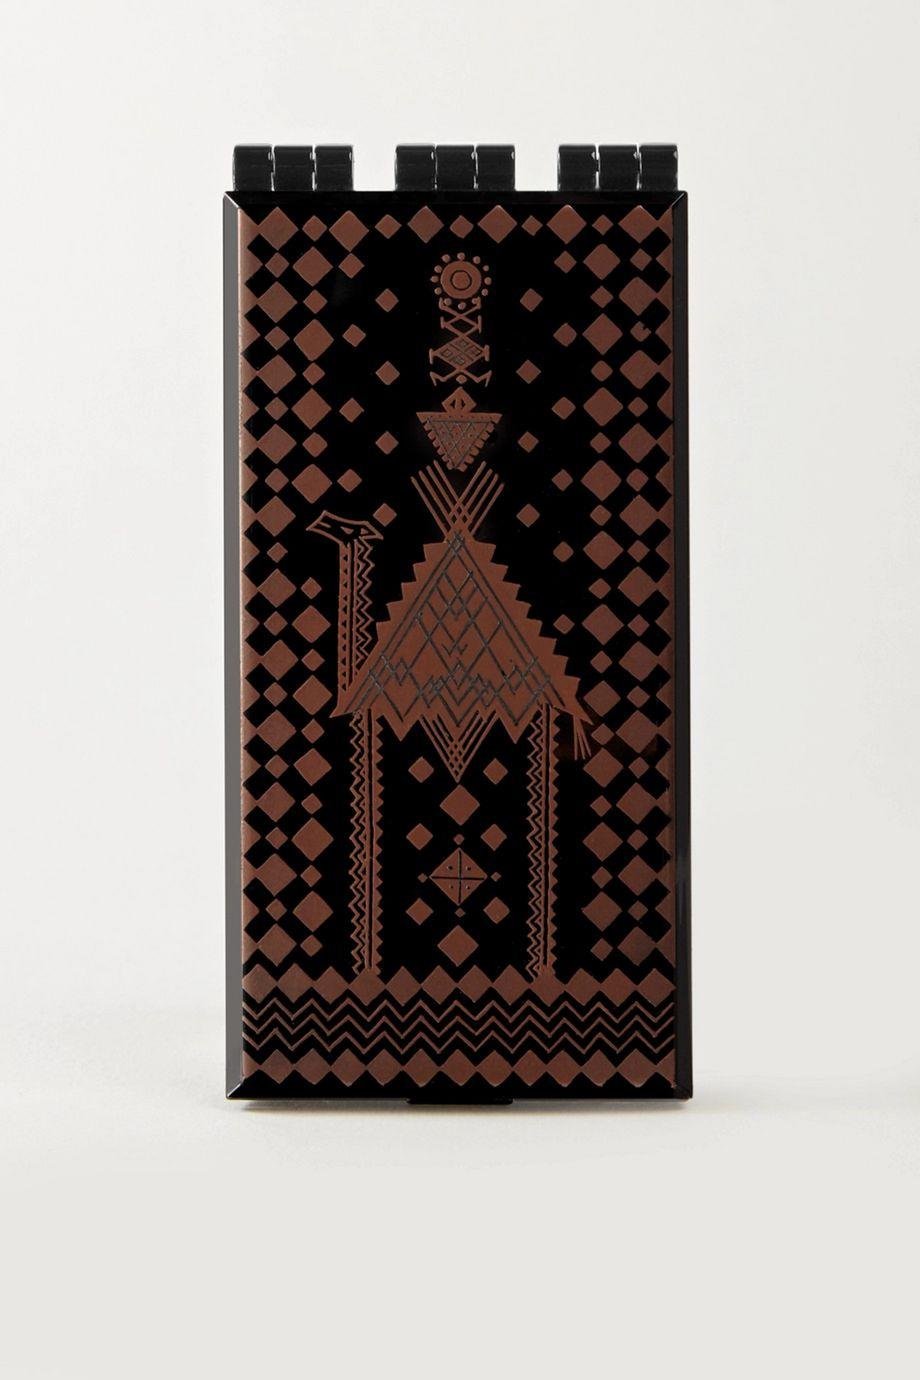 Serge Lutens Lacquered Powder Case – Bronze/Black – Puderdose